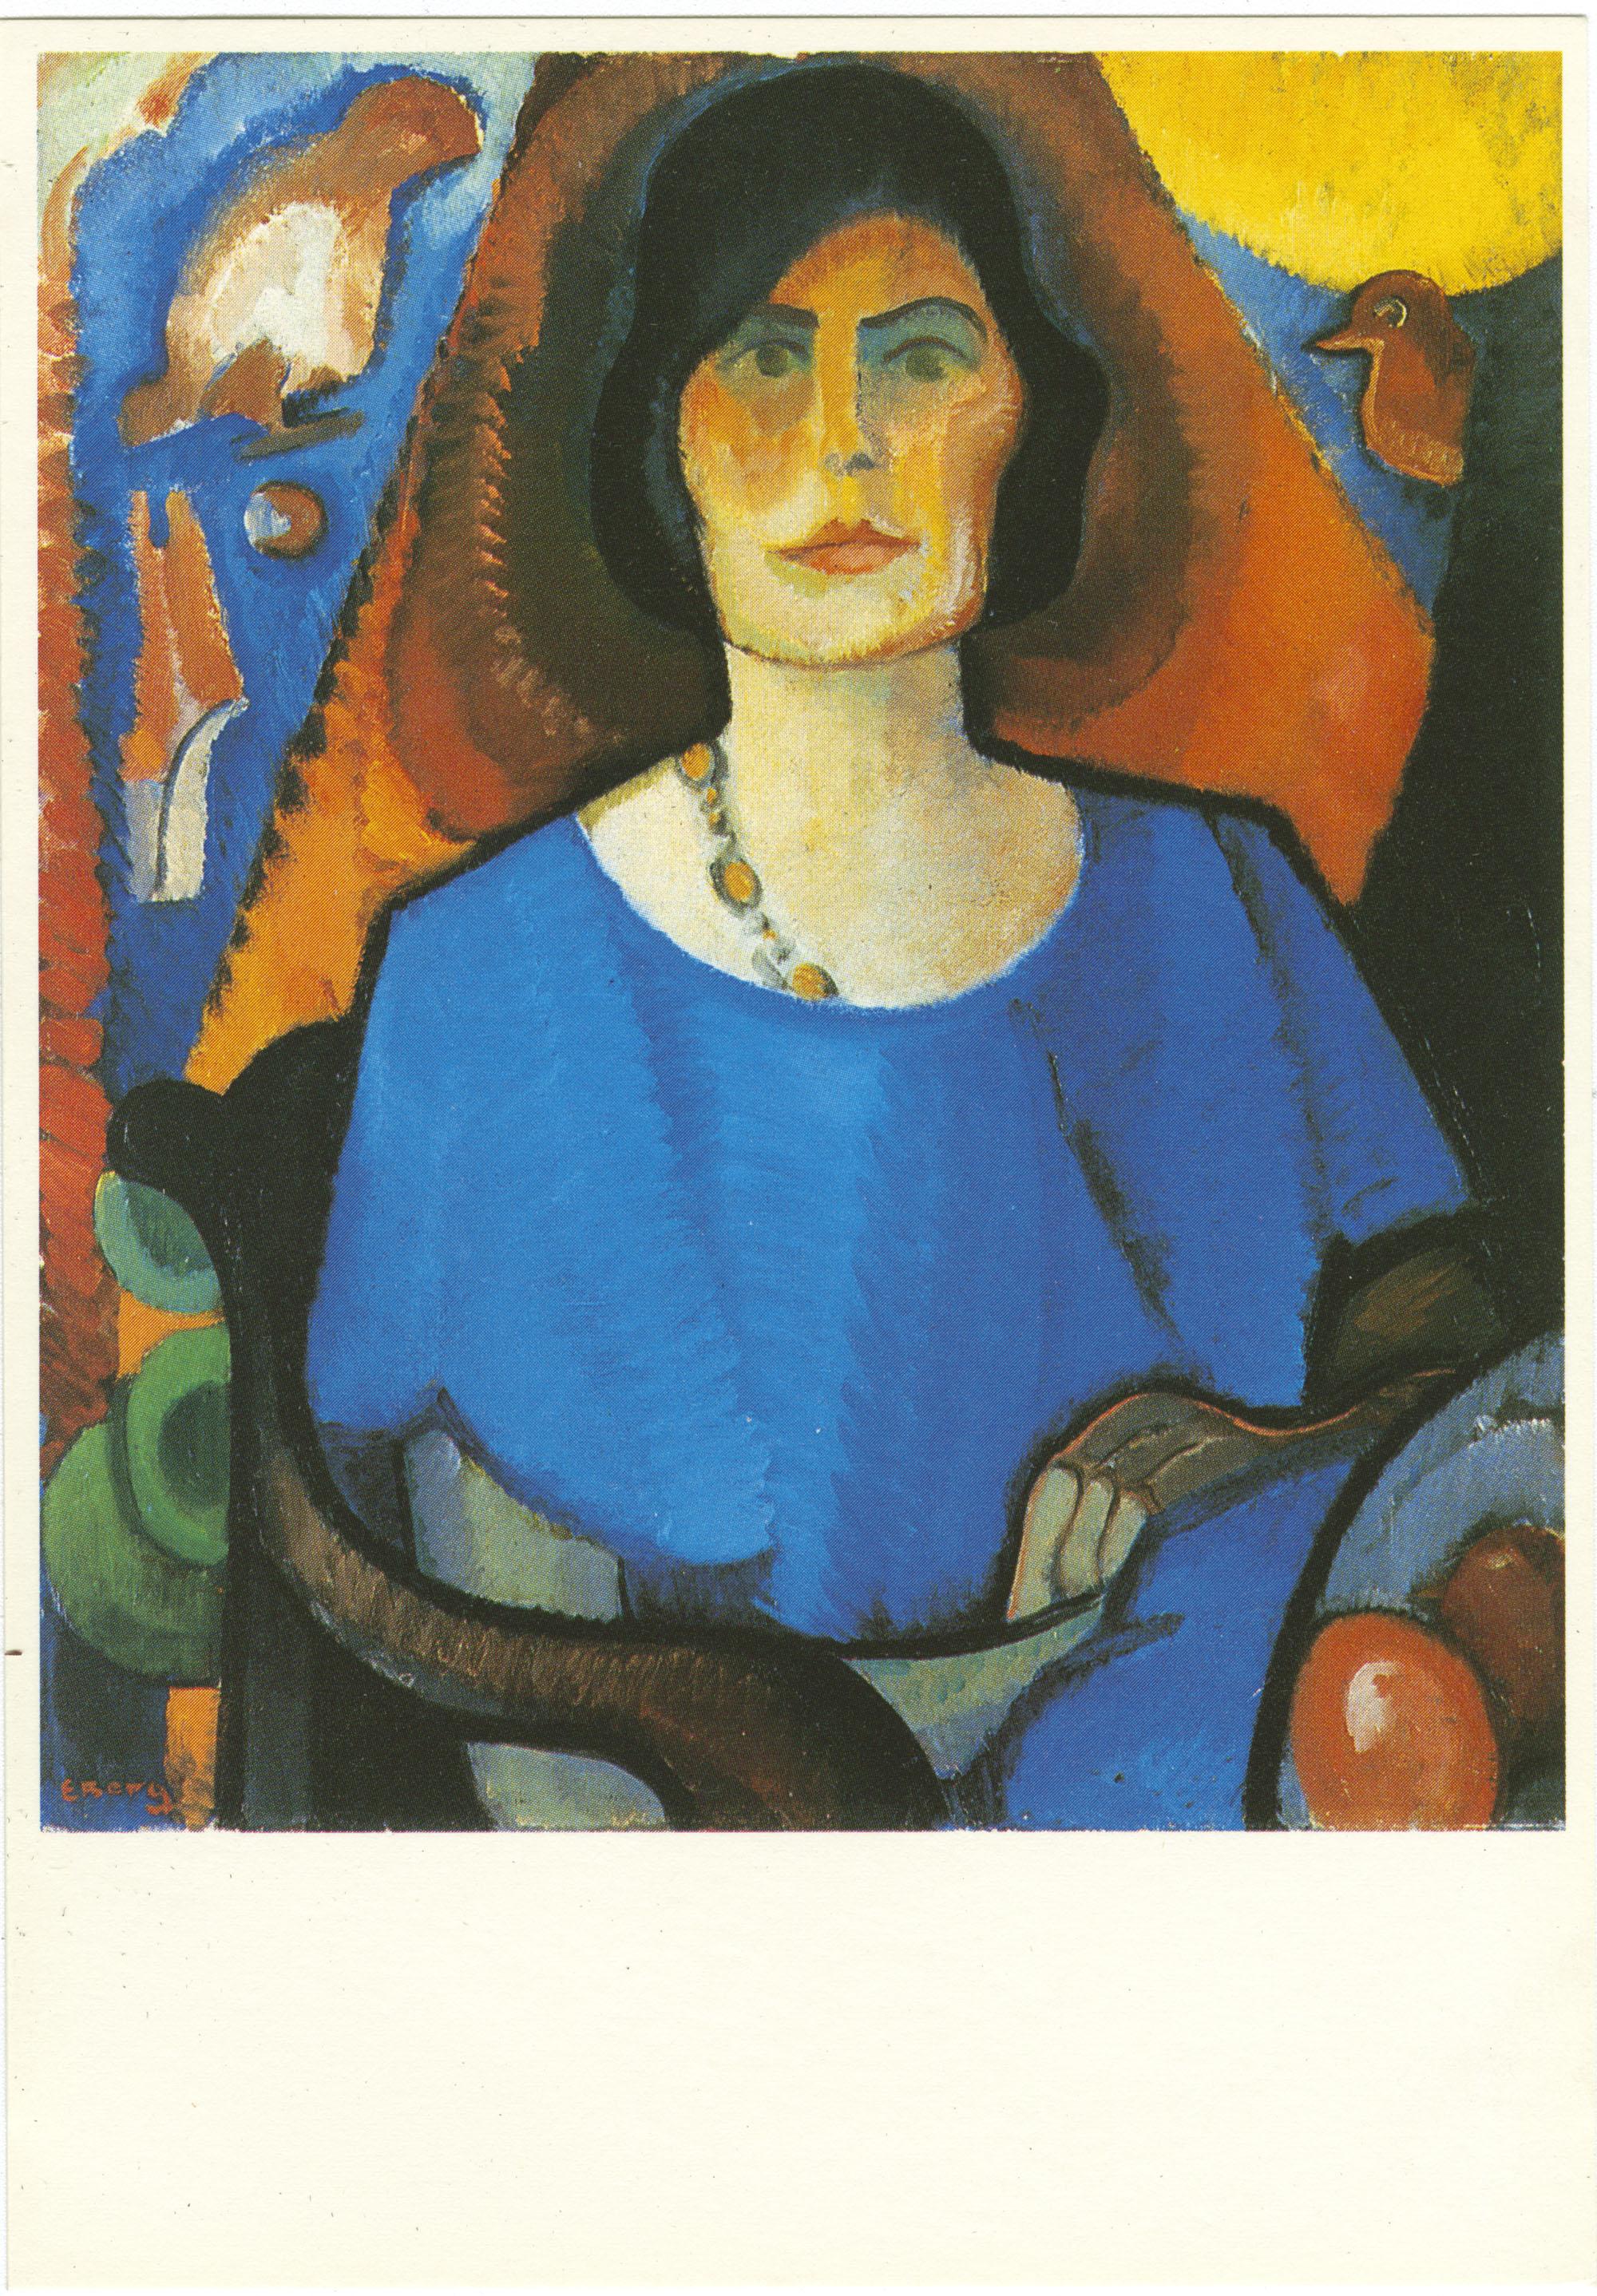 Else Berg (1877-1942) Zelfportret, olievert op doek / Self portrait, oil on canvas, ca. 1930